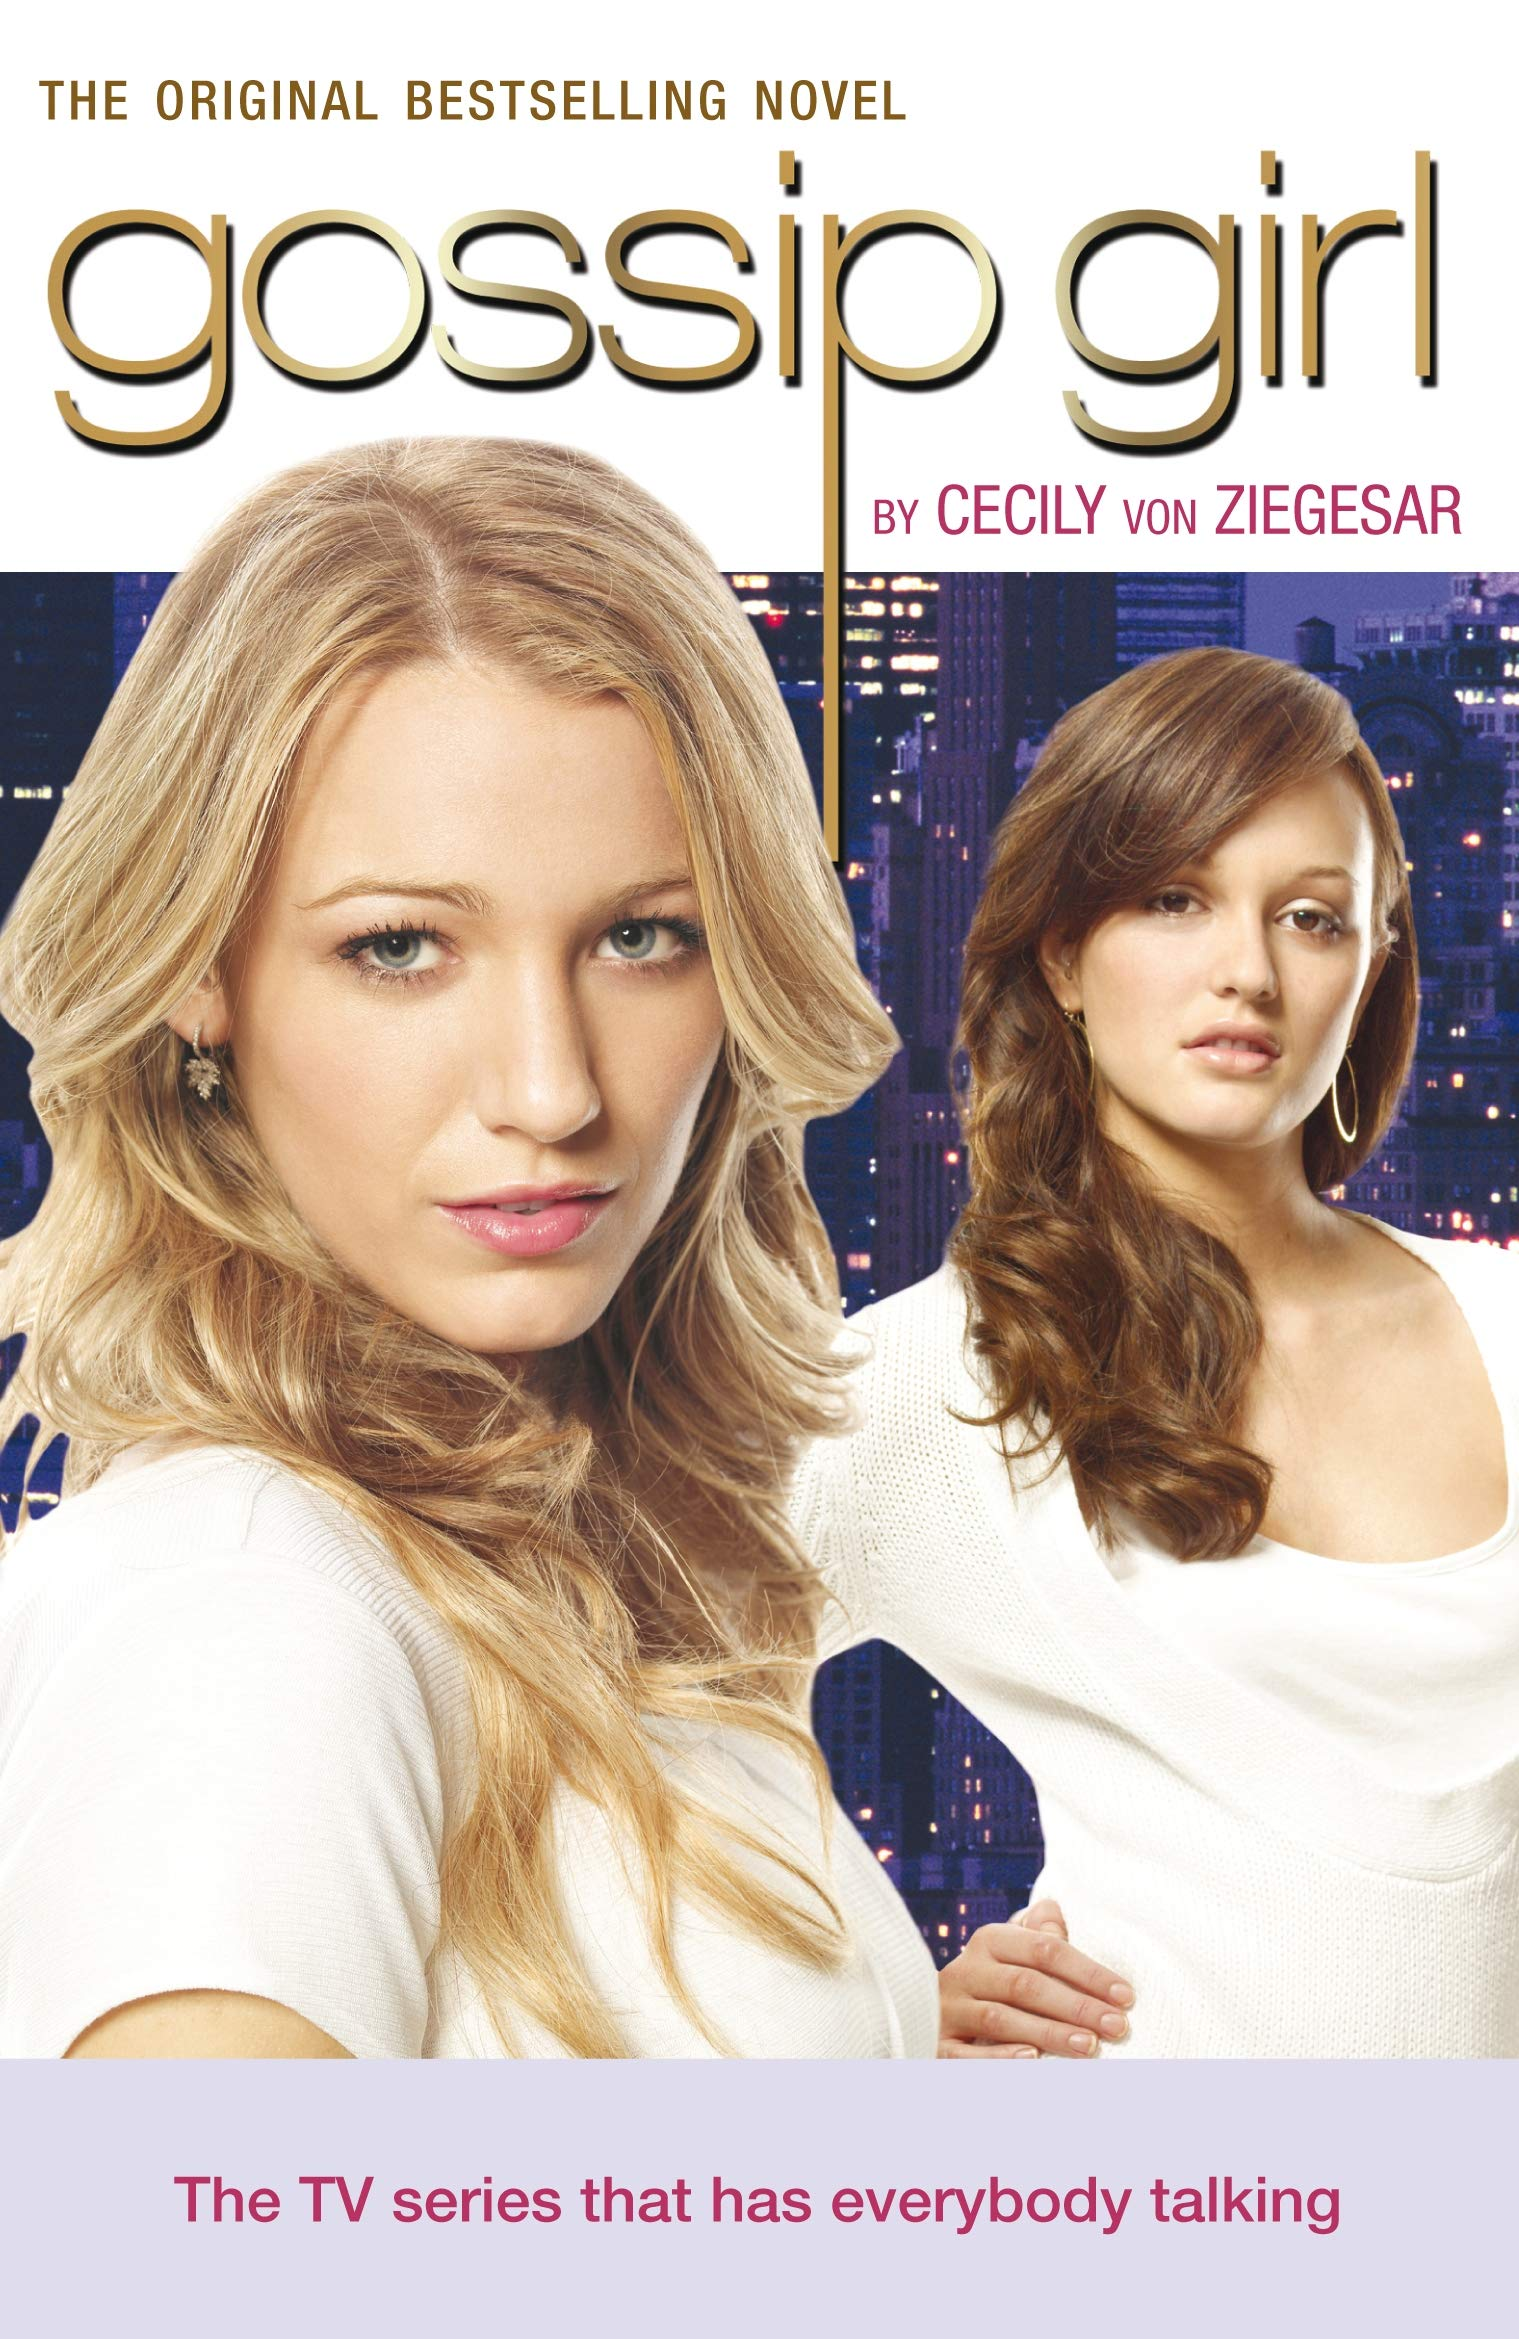 Gossip Girl 1 - TV tie-in edition (English Edition)